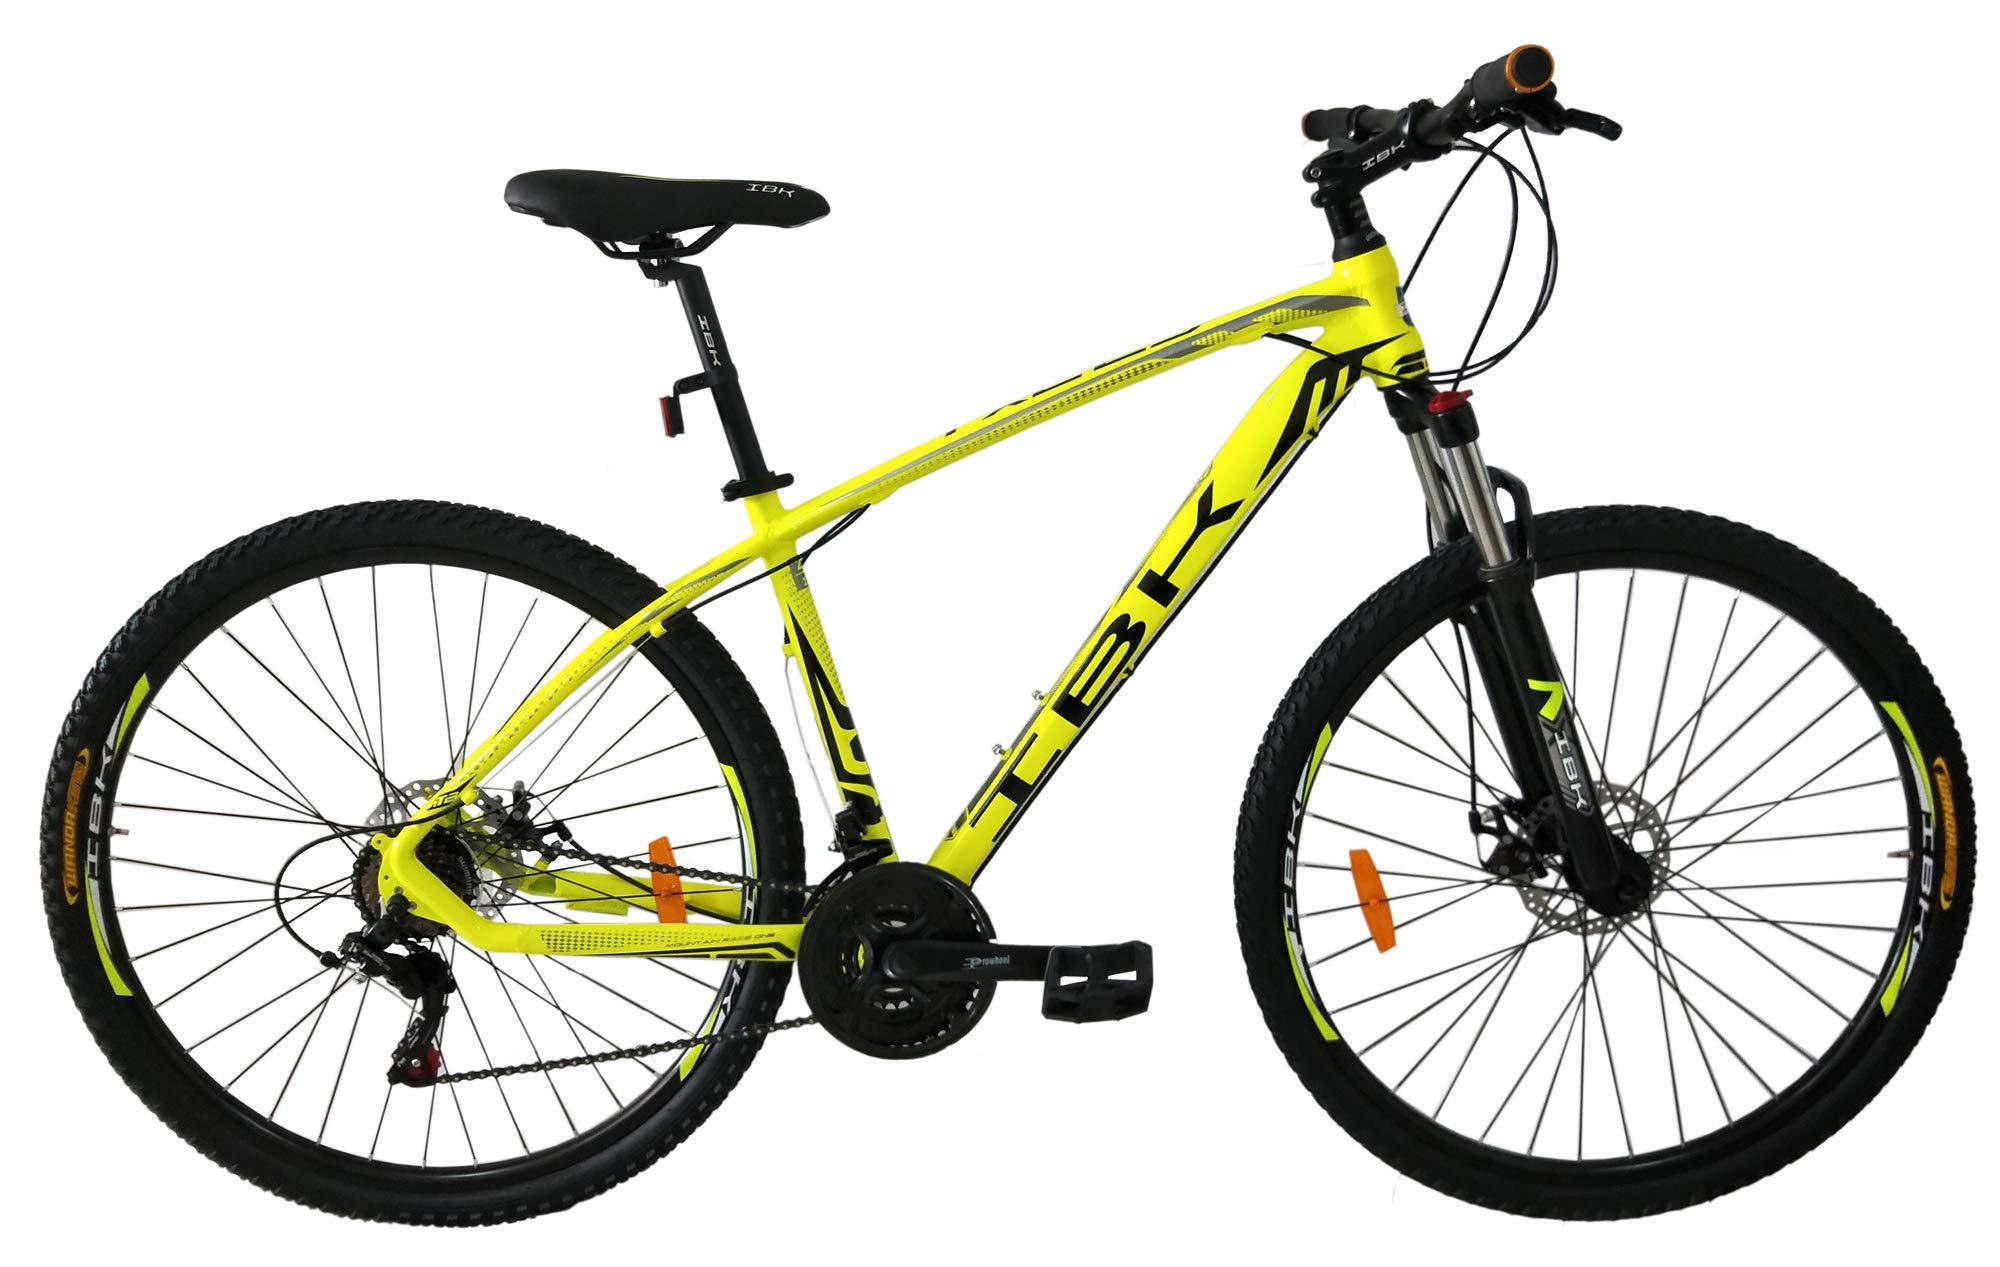 IBK Bici Bicicletta MTB Mountain Bike